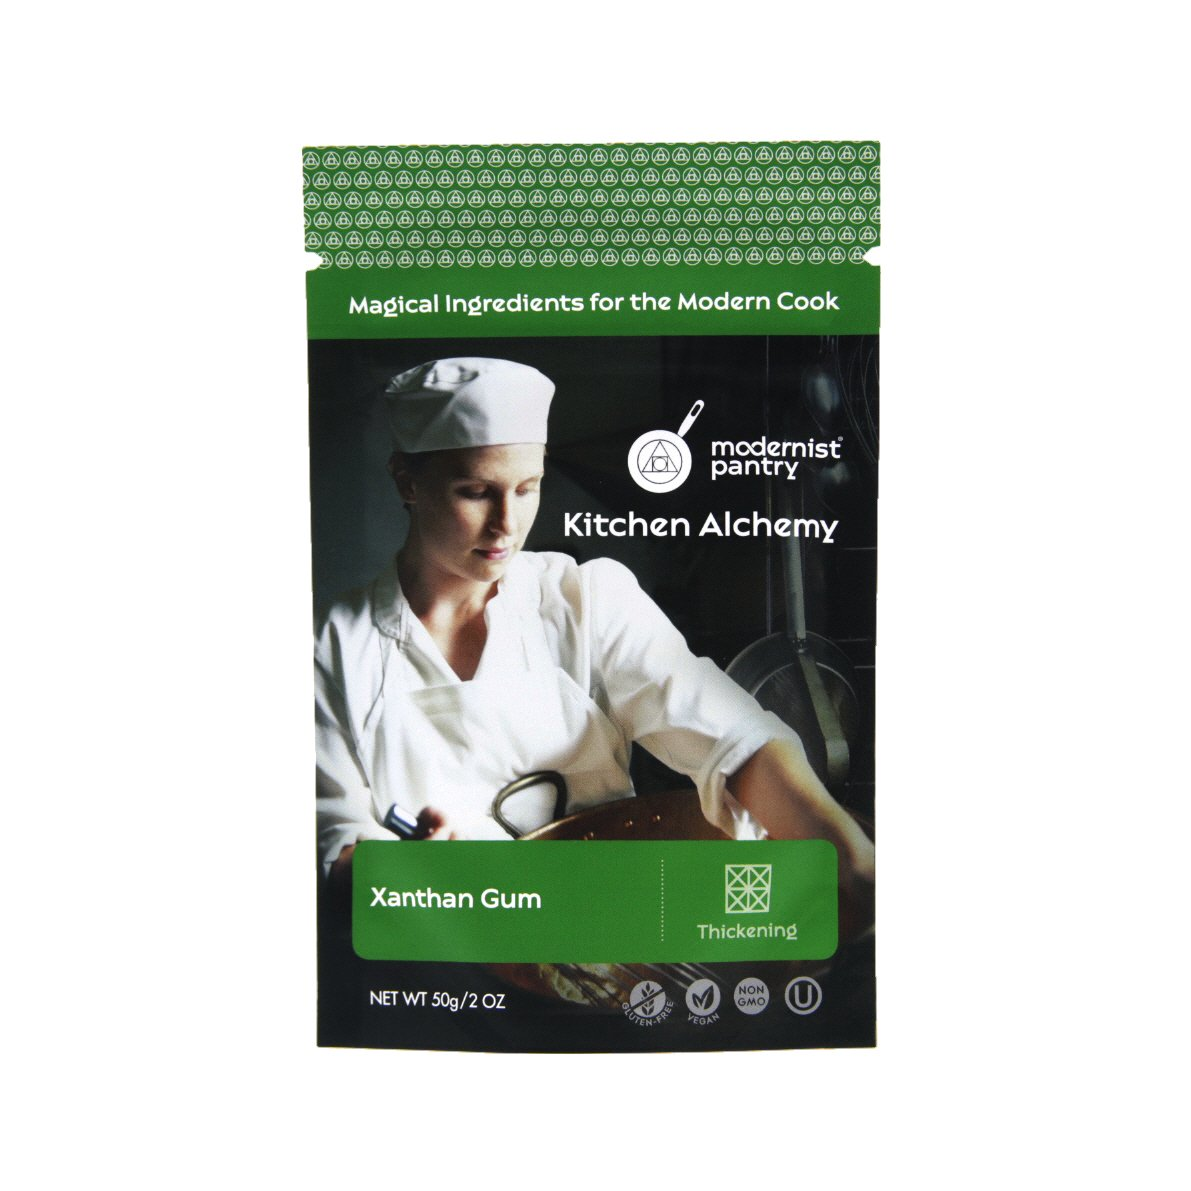 Pure Xanthan Gum ⊘ Non-GMO ❤ Gluten-Free ☮ Vegan ✡ OU Kosher Certified - 50g/2oz